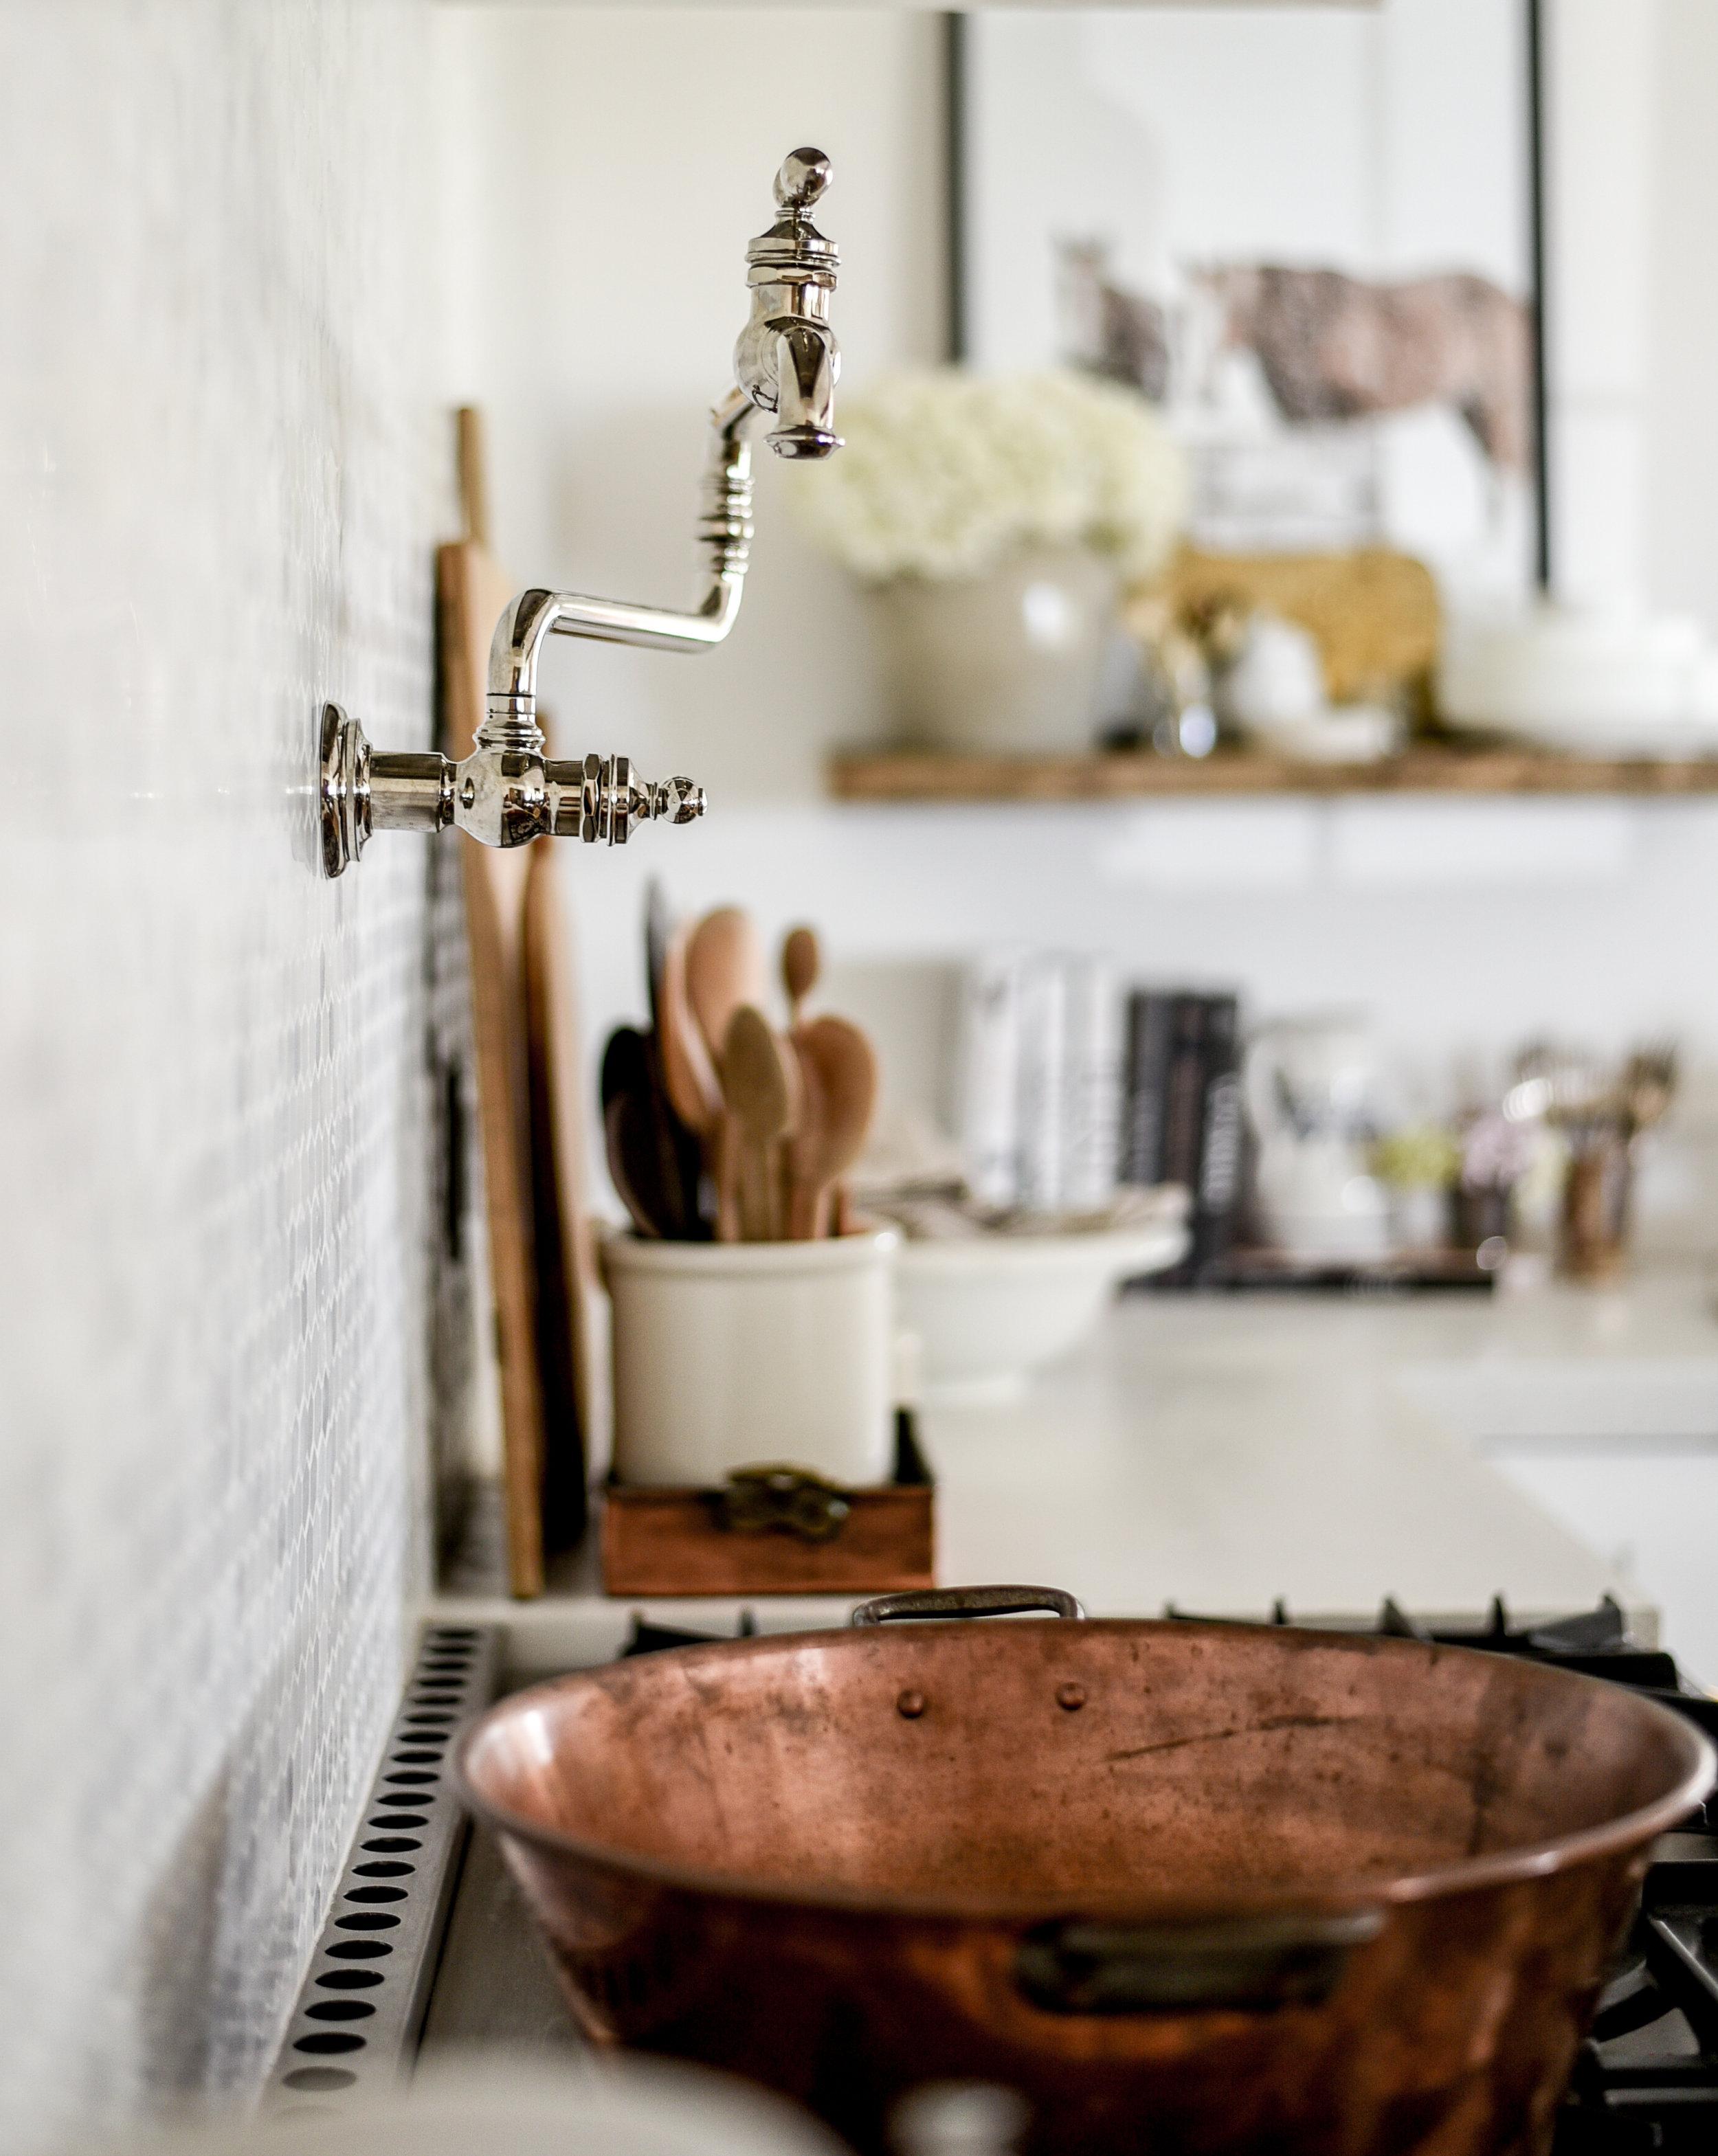 Kohler's artifacts pot filler & la cornue stove - a remodeled farmhouse kitchen | boxwoodavenue.com